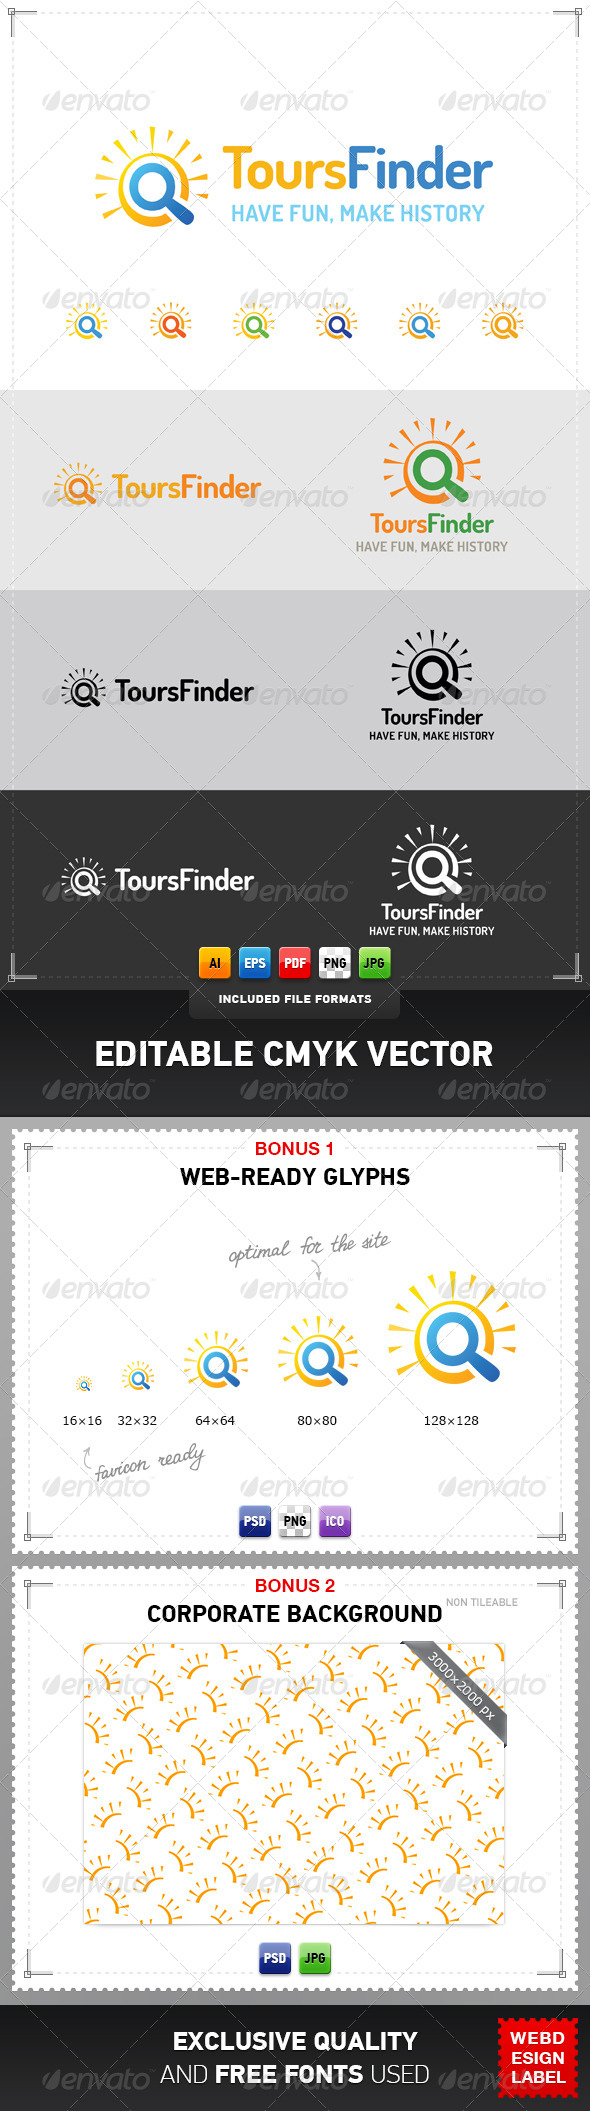 GraphicRiver Tours Finder Logo 4369194